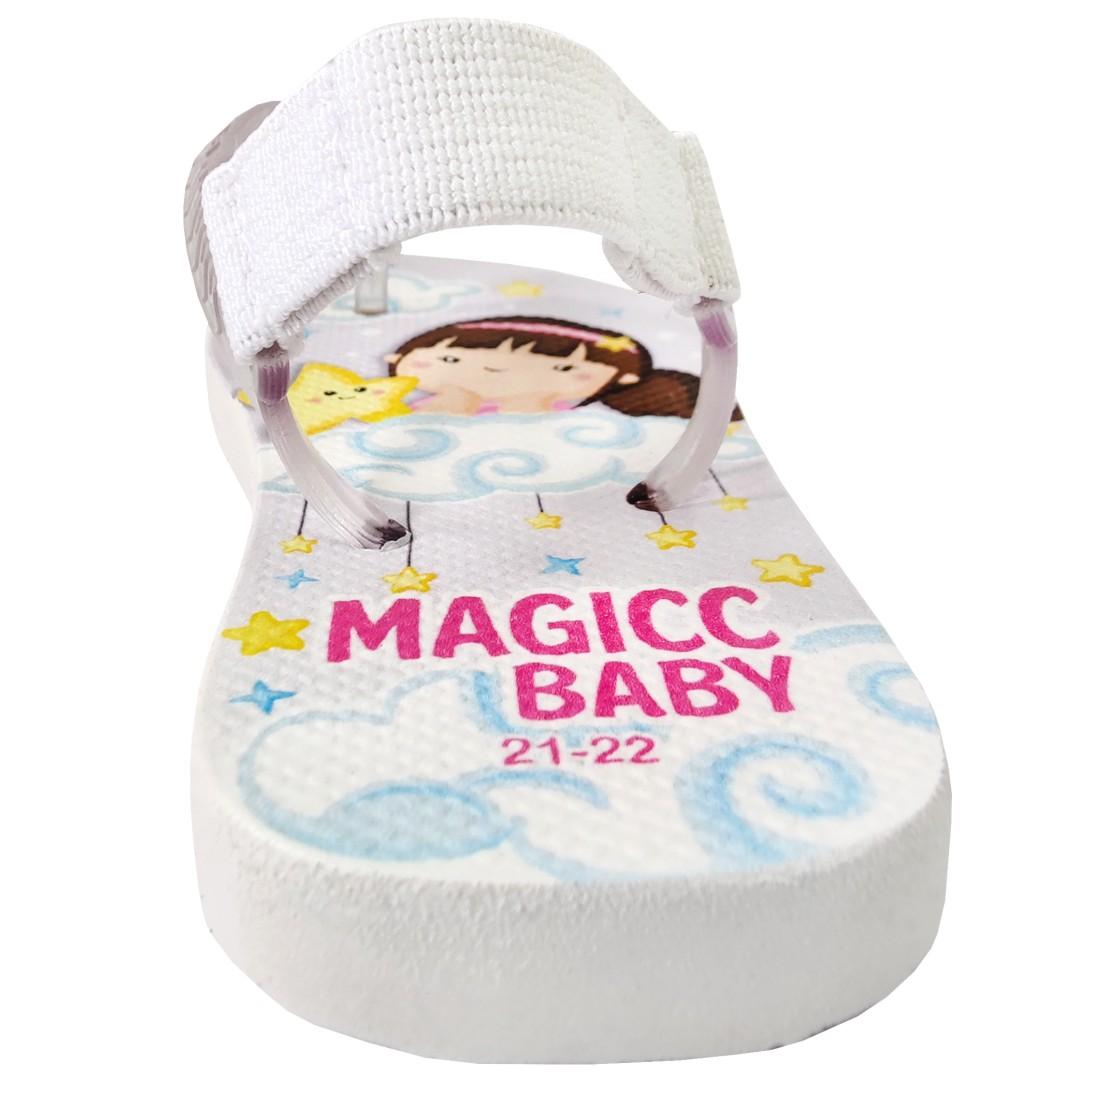 Chinelo Menina Bebê Sandália Menininha Estrela Magicc Baby